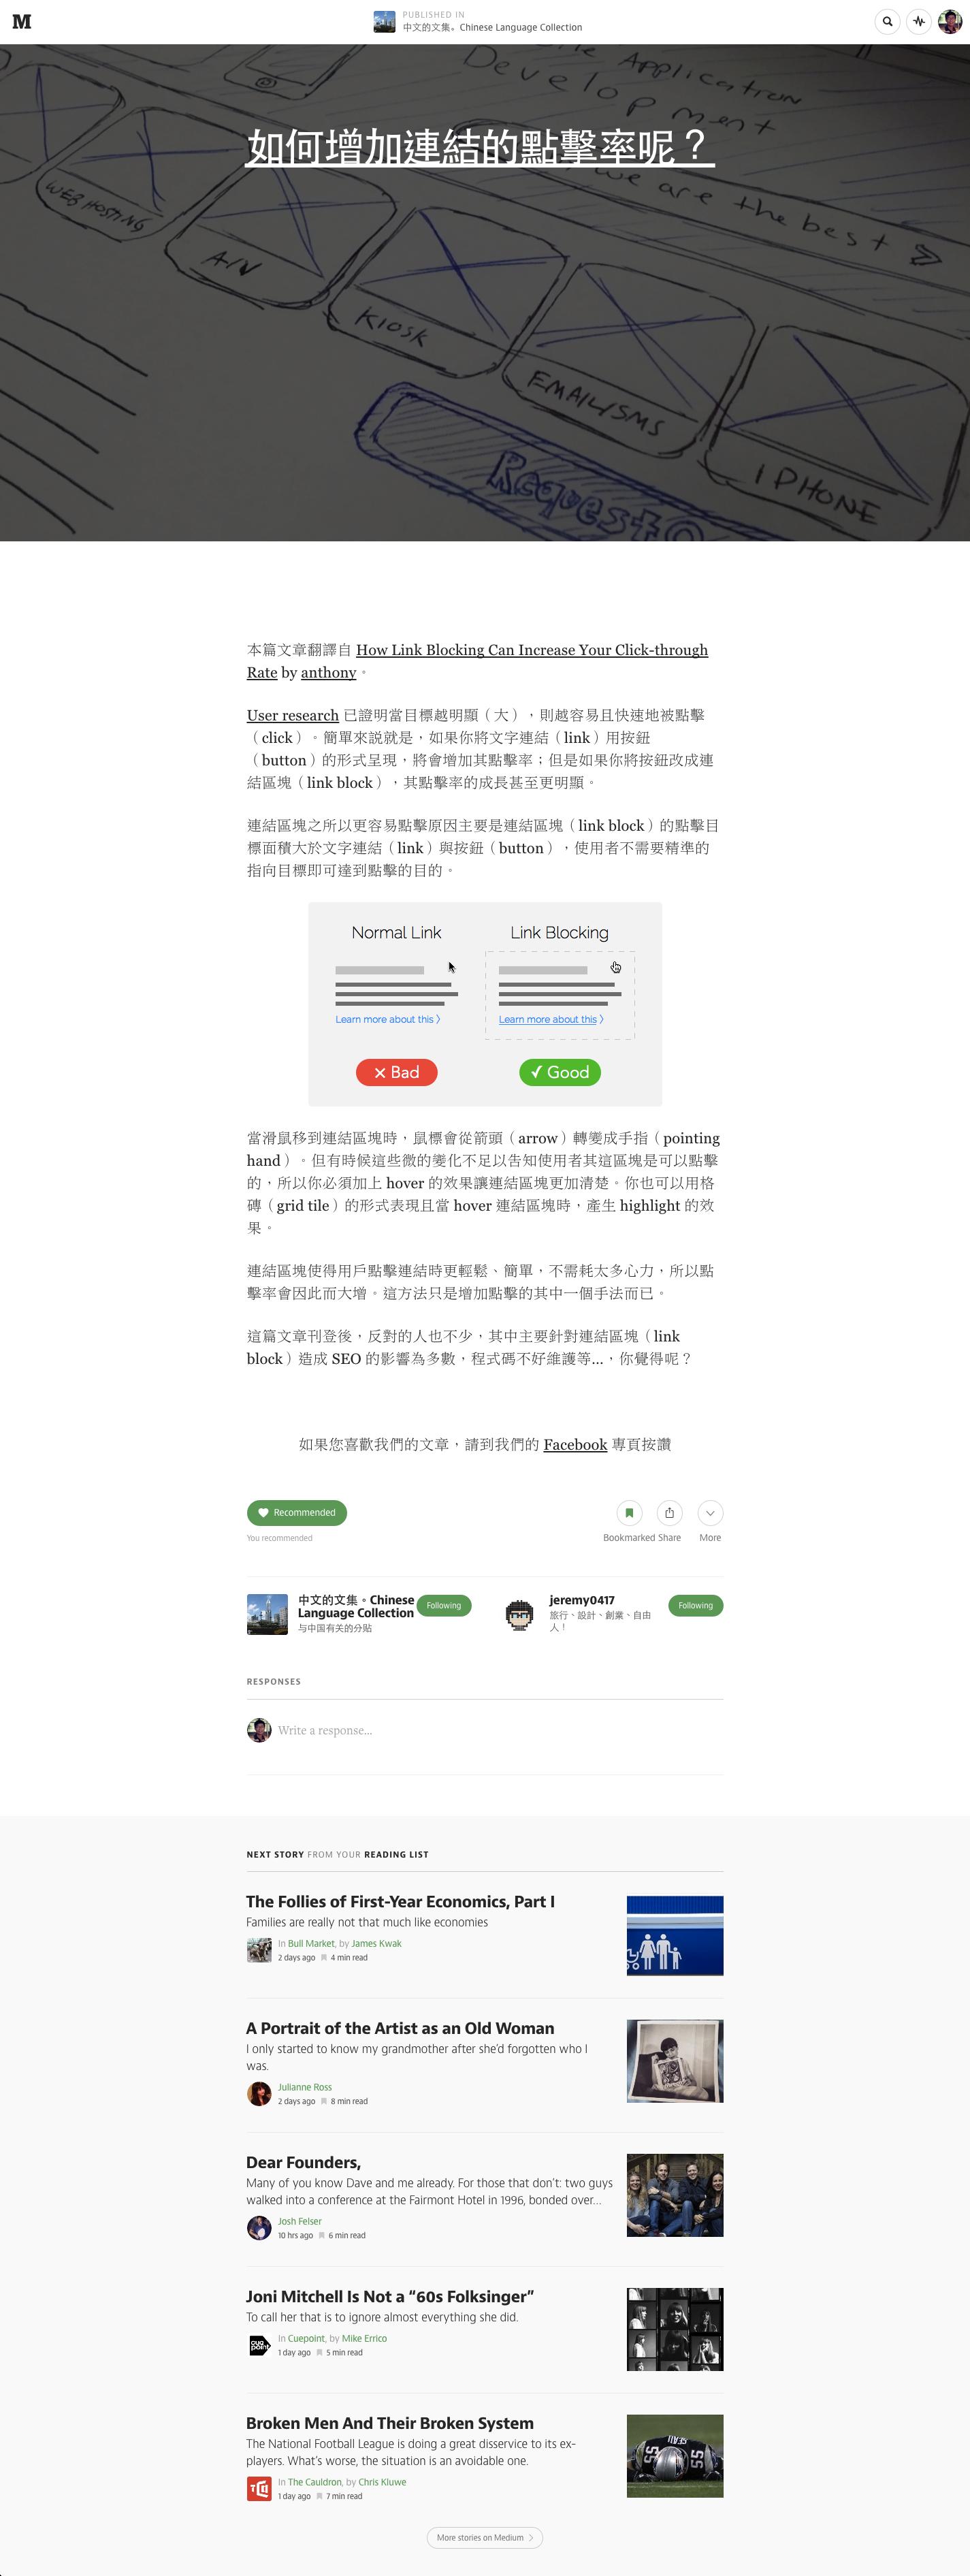 Medium的单篇文章页面 Snip20150403_14